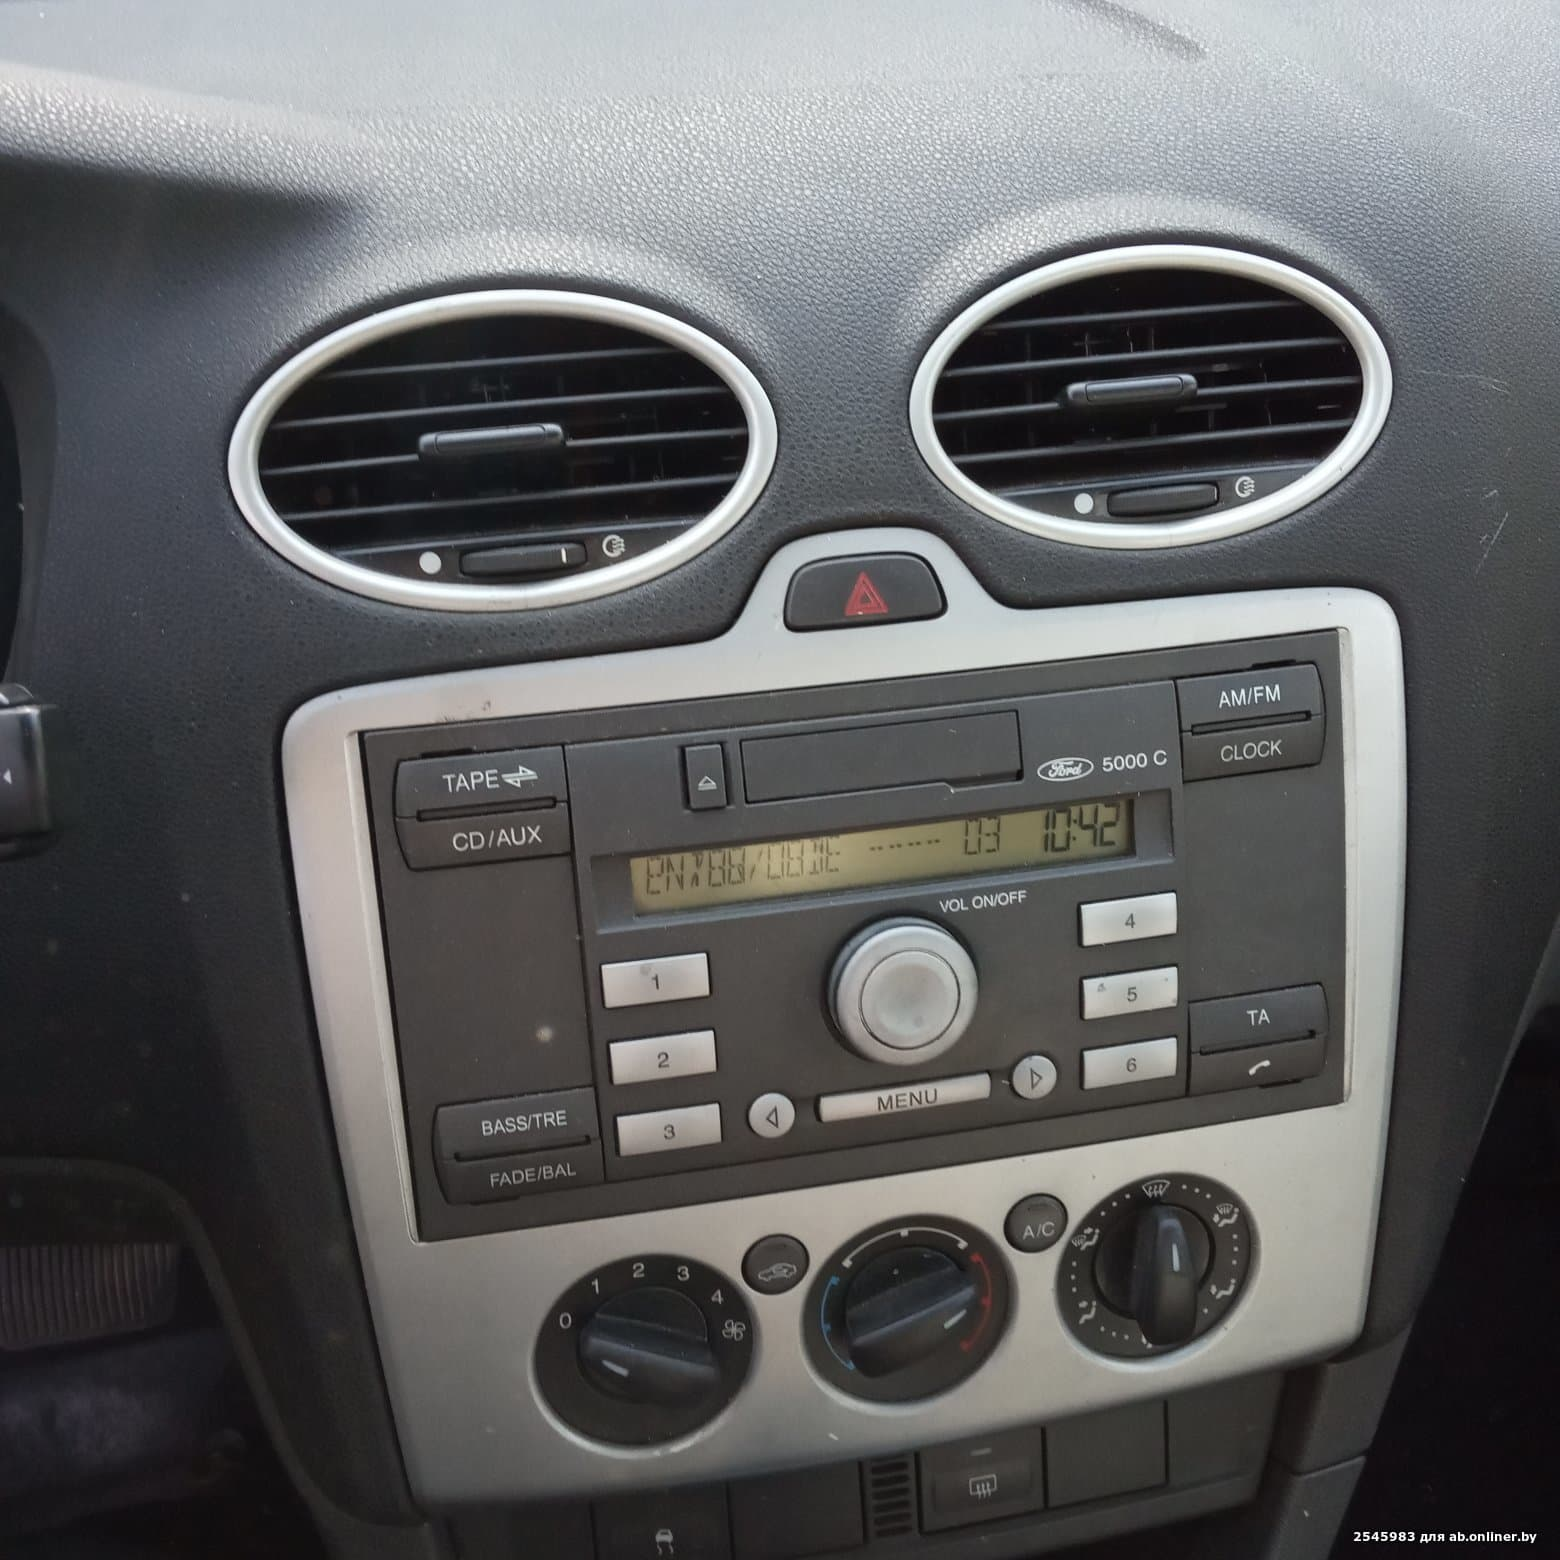 Ford Focus Duratorq TDCi - DV6